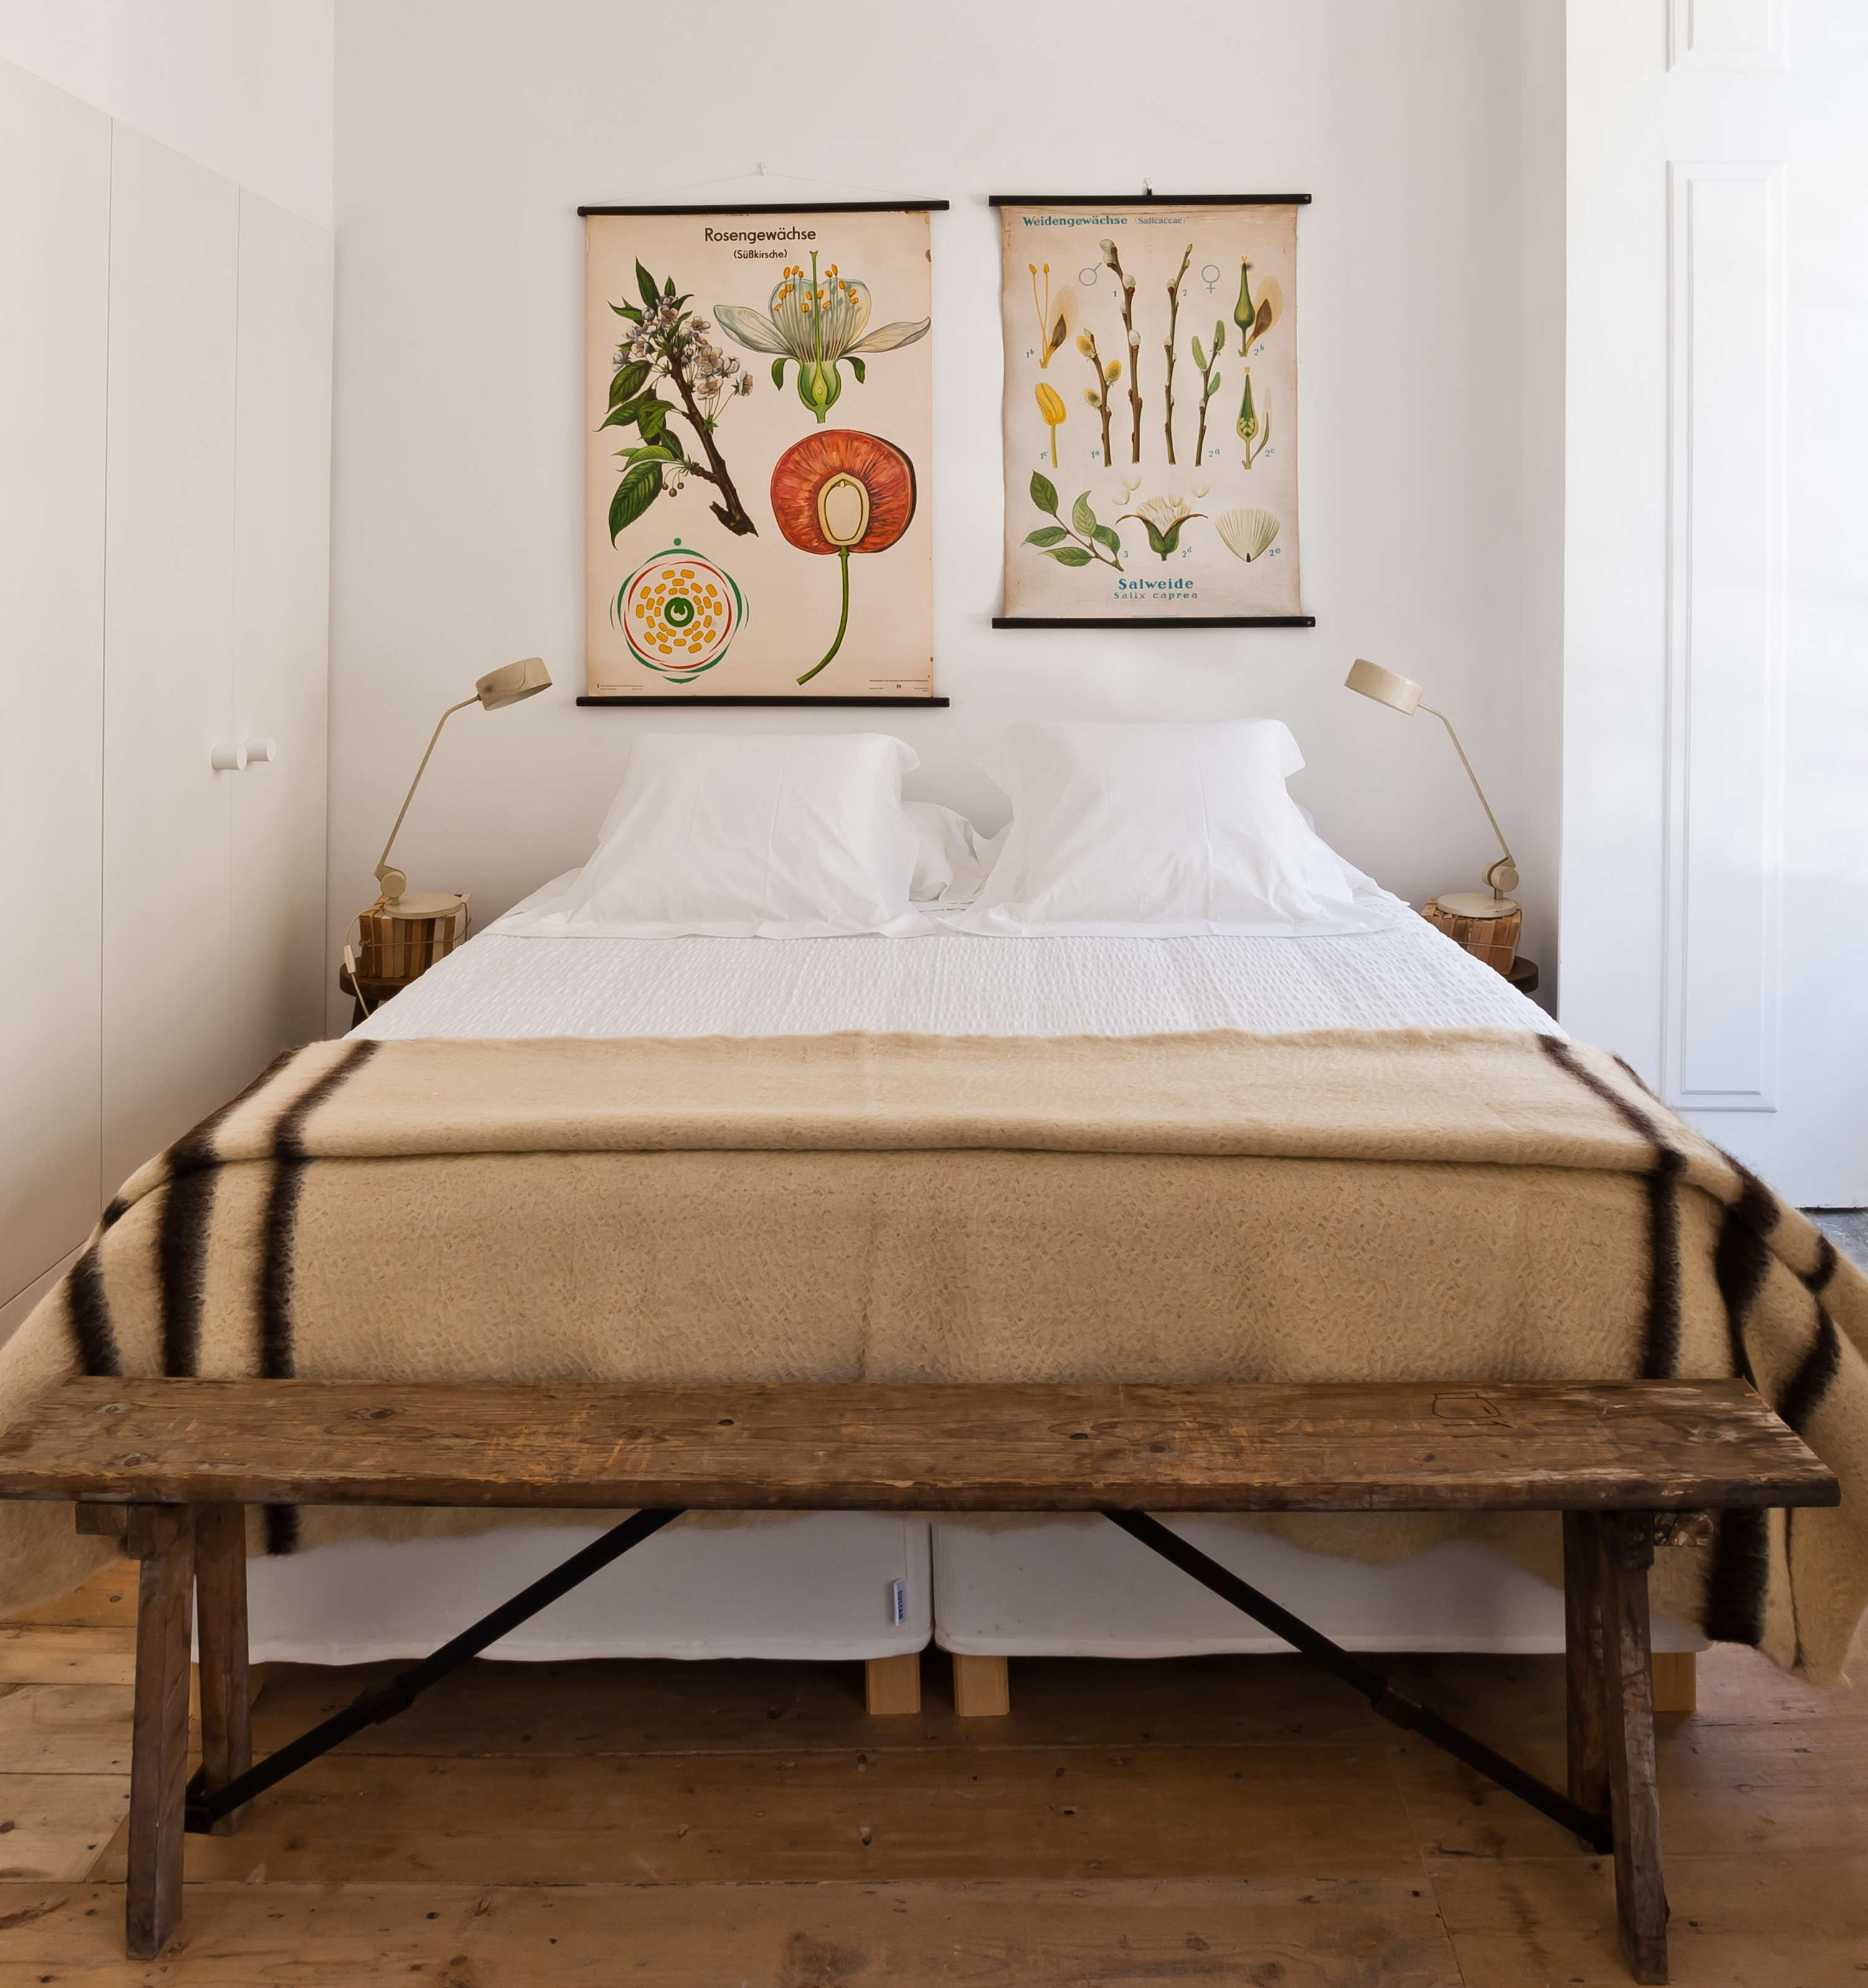 baixa house bedroom in lisbon, portugal 12